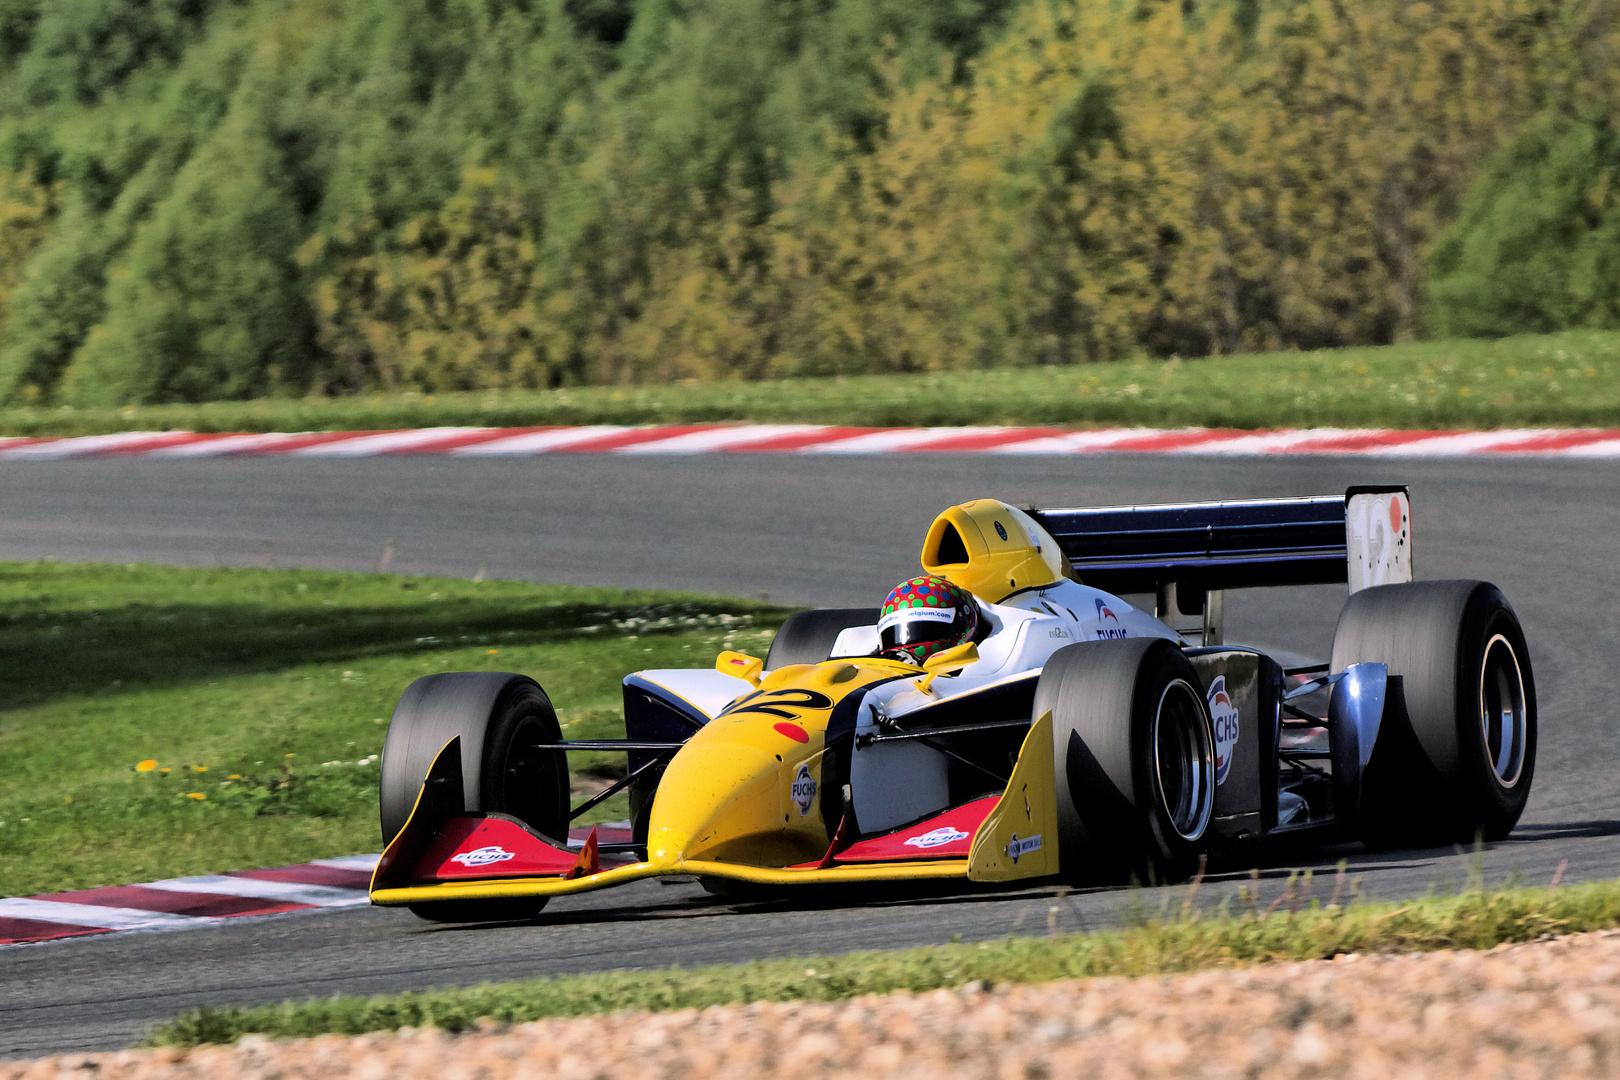 G-Force Indycar